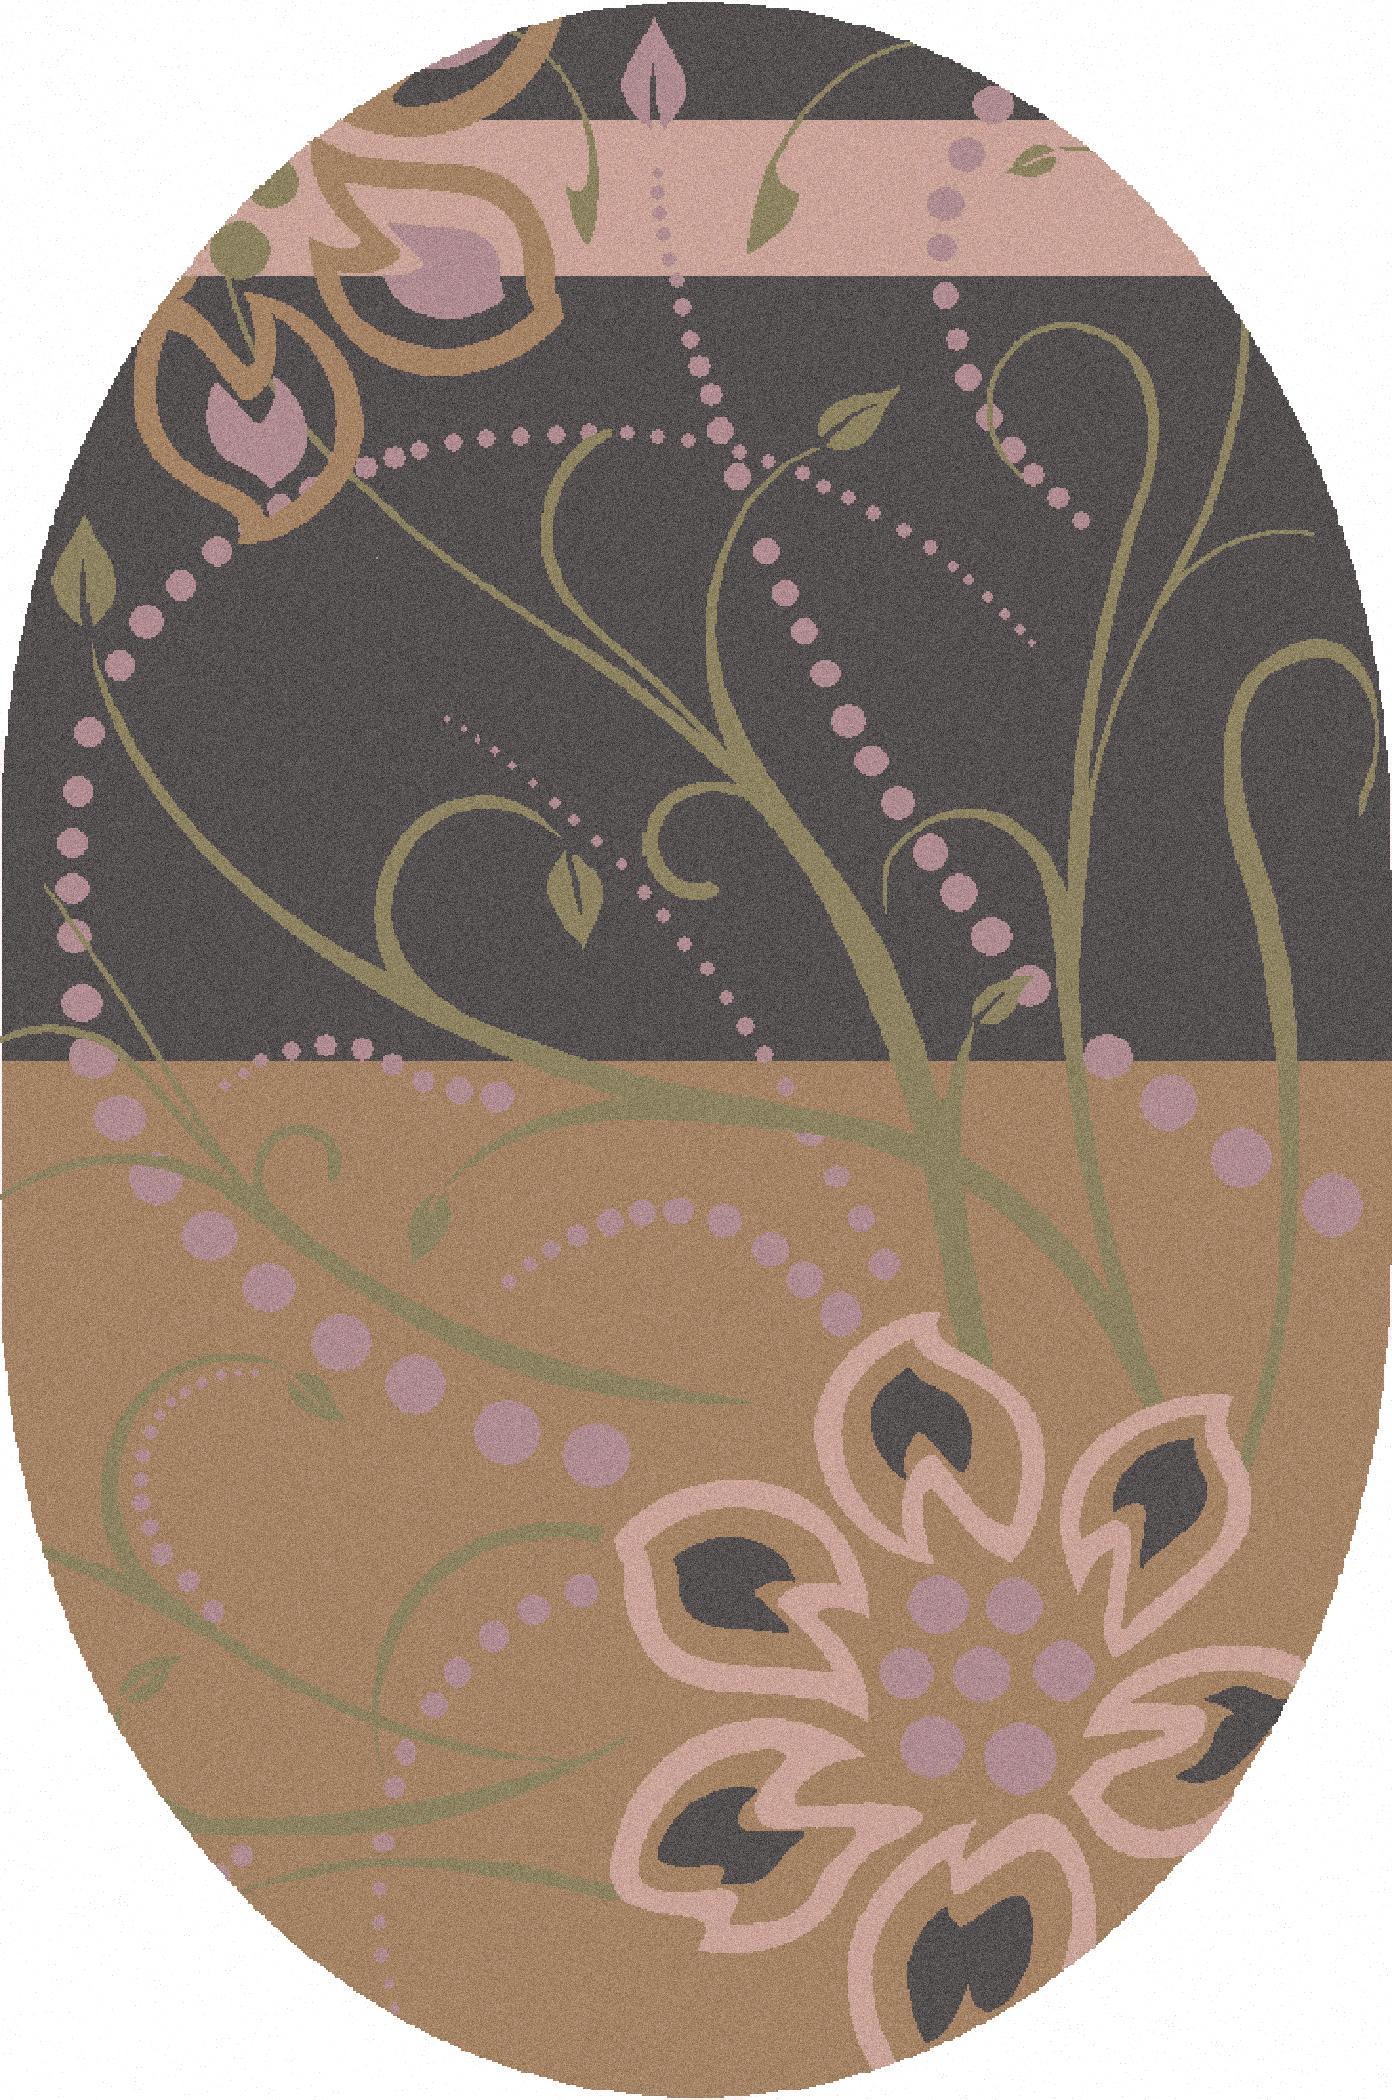 Surya Rugs Athena 8' x 10' Oval - Item Number: ATH5128-810OV